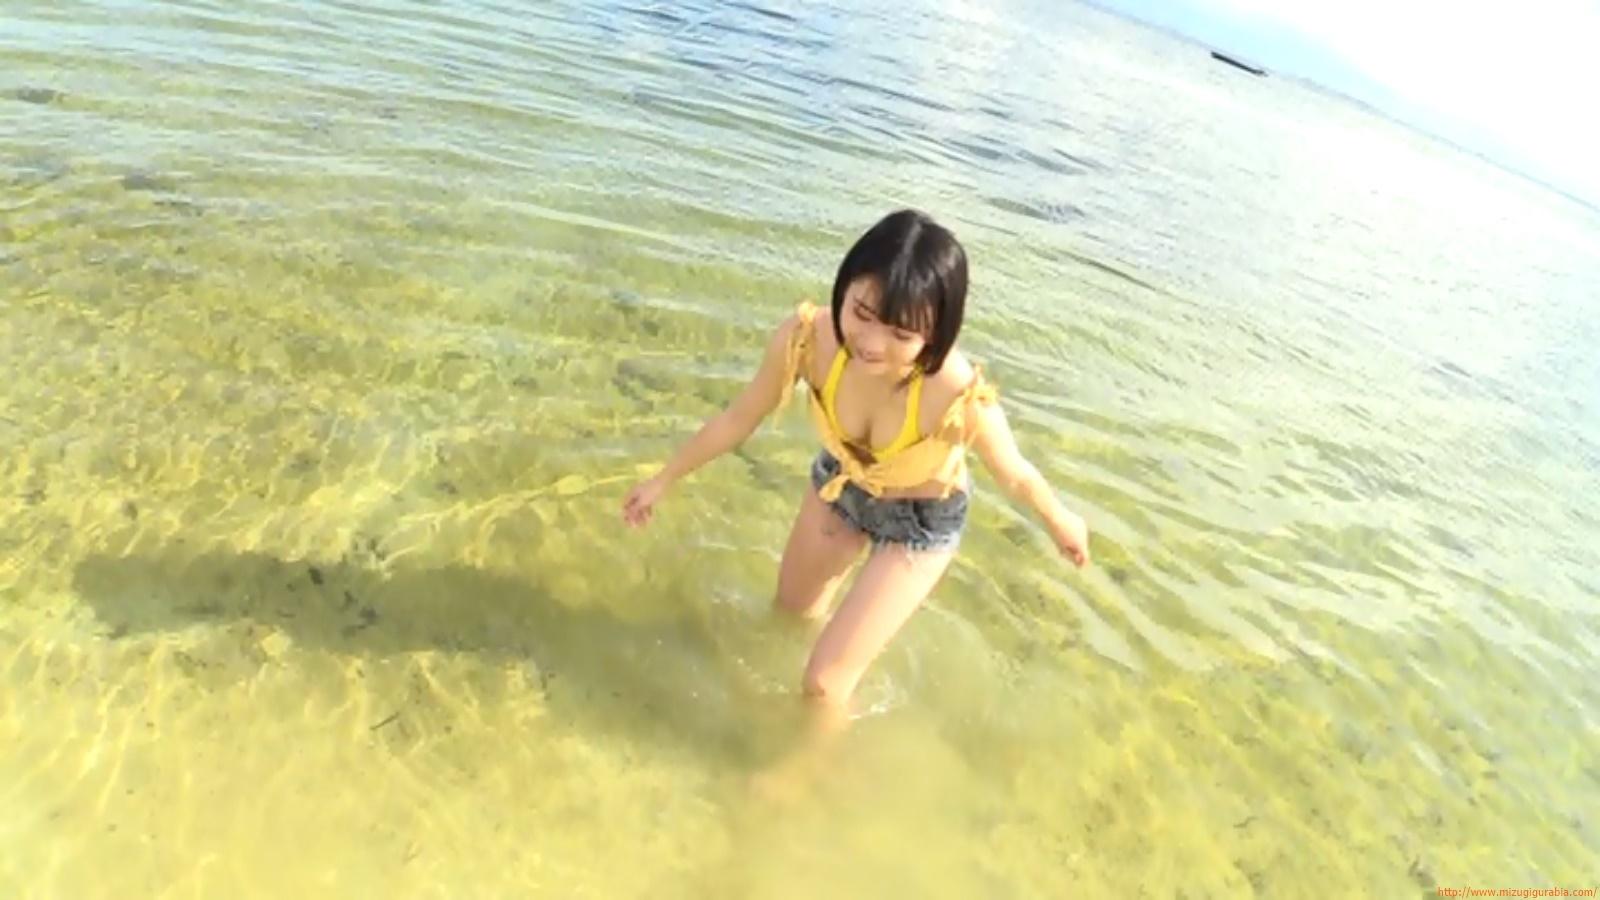 Beach dating098